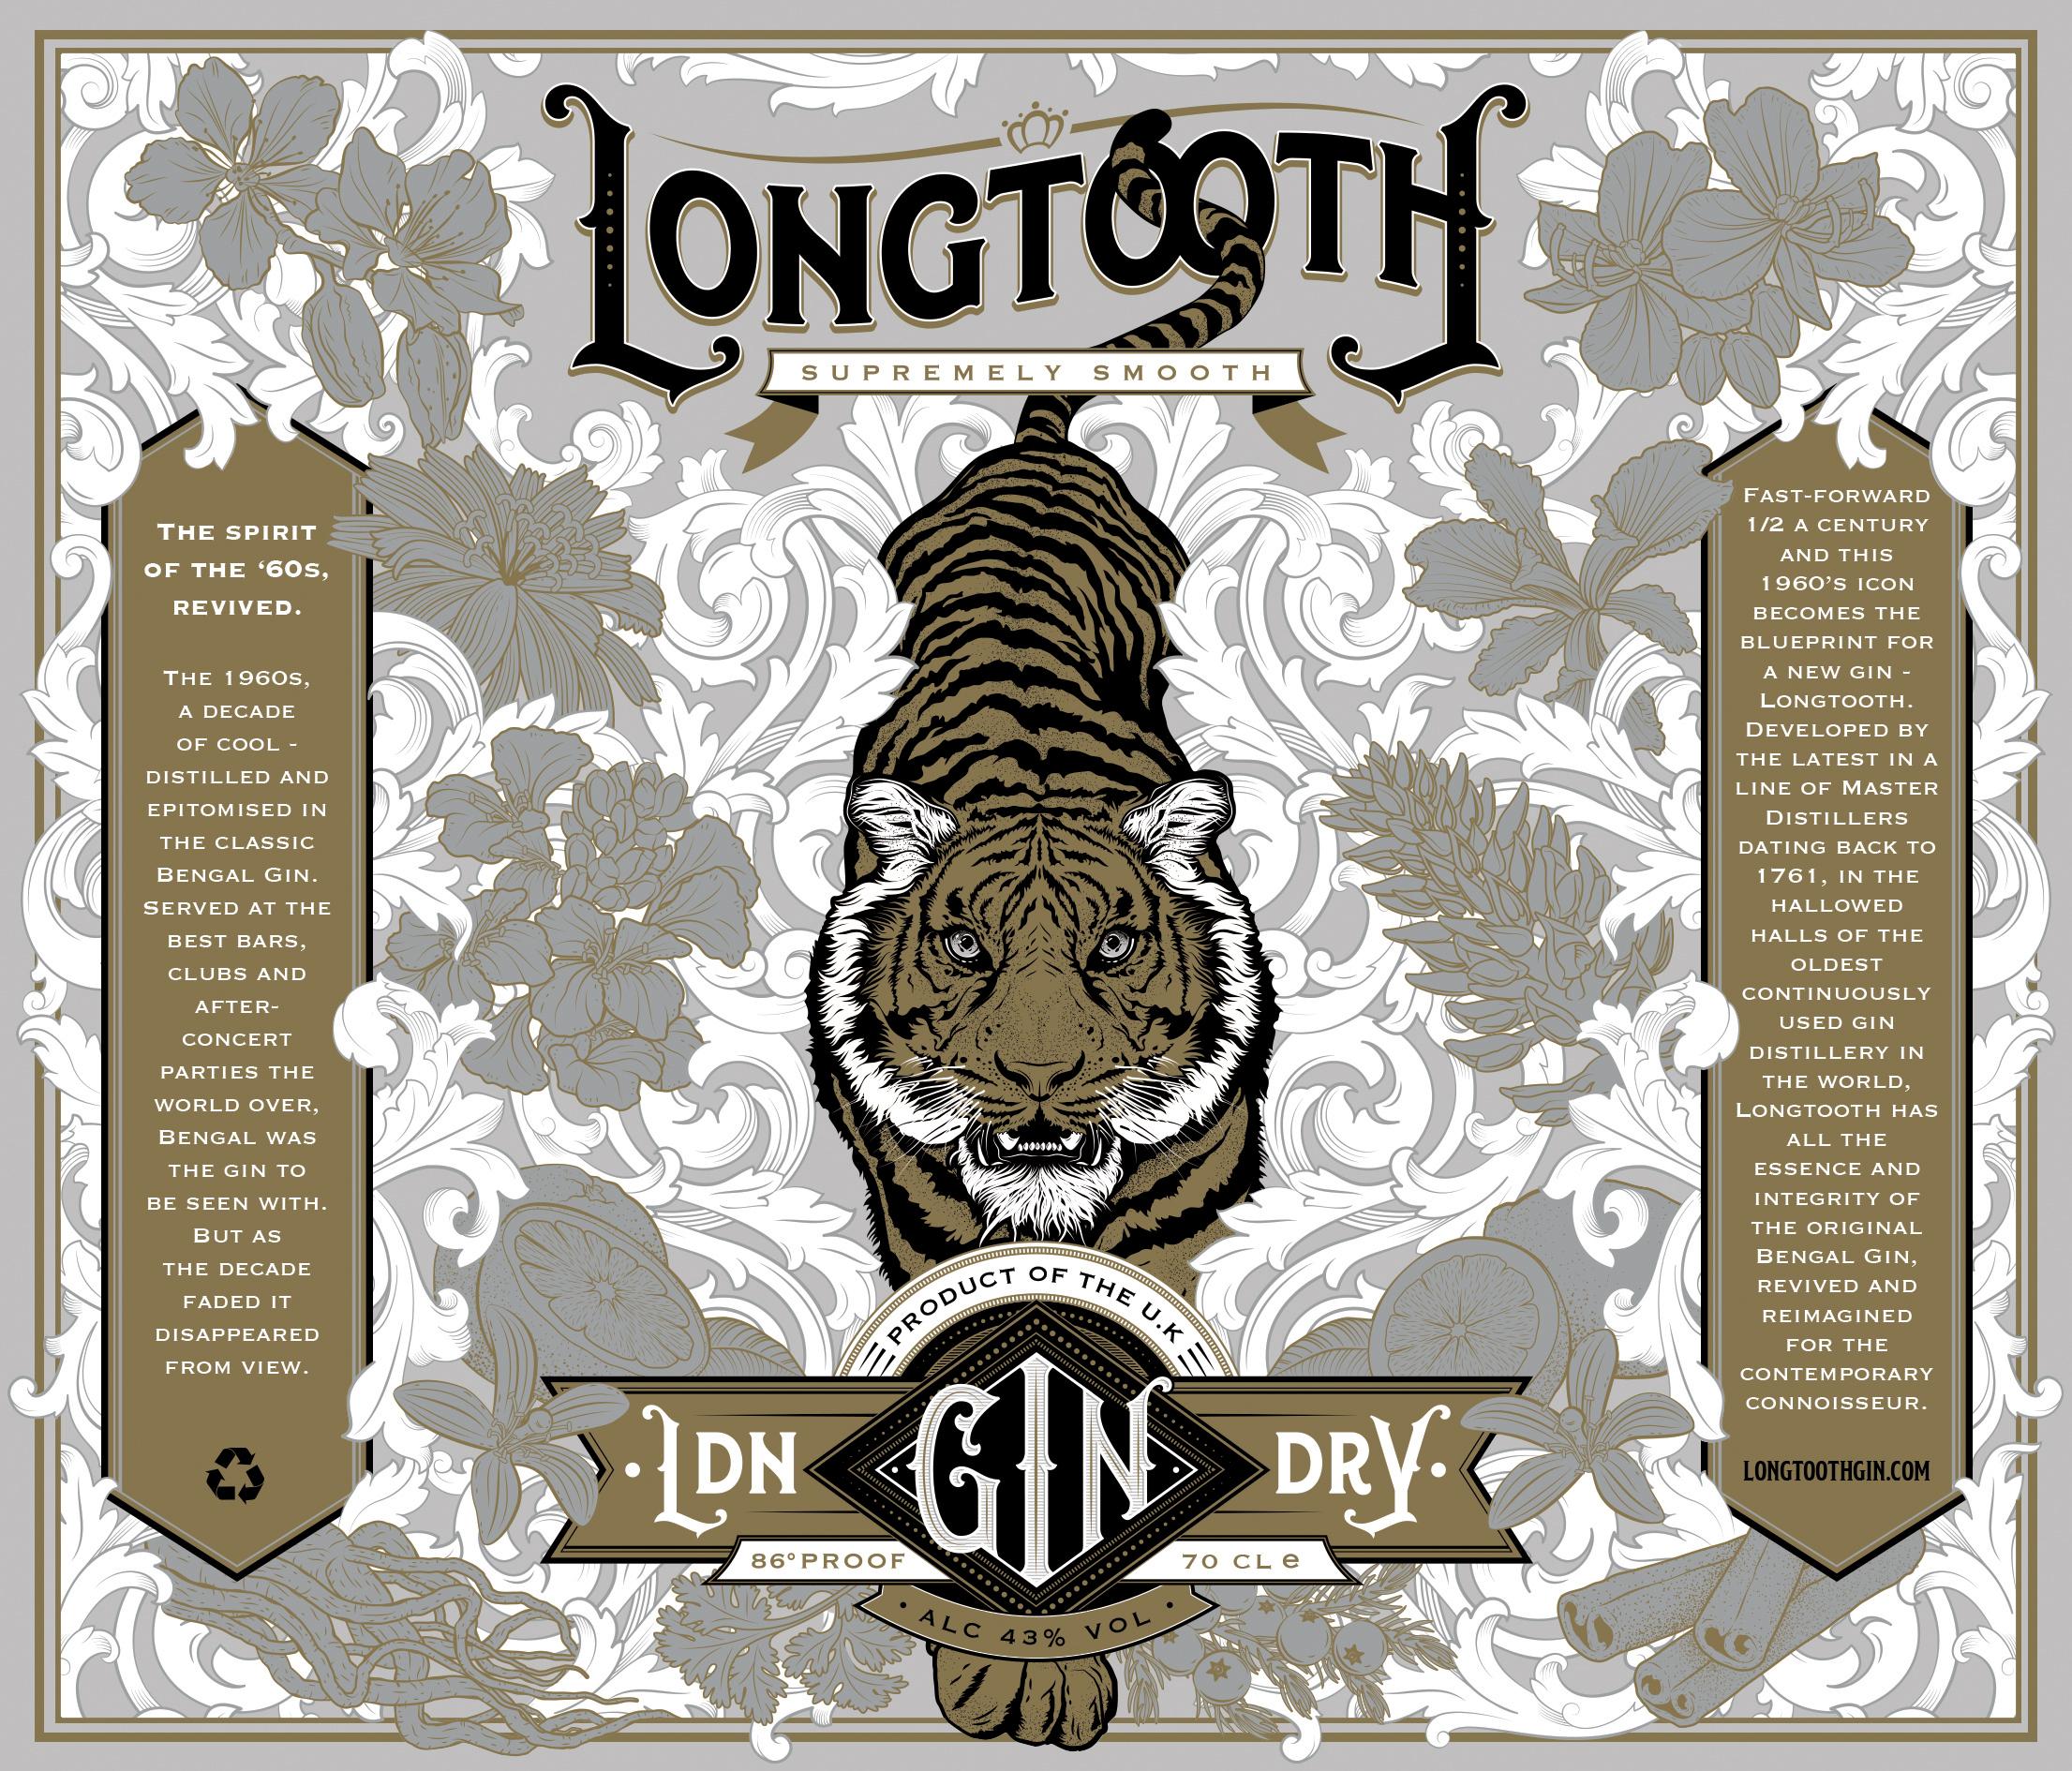 Longtooth_Bottle Label_FINAL.jpg